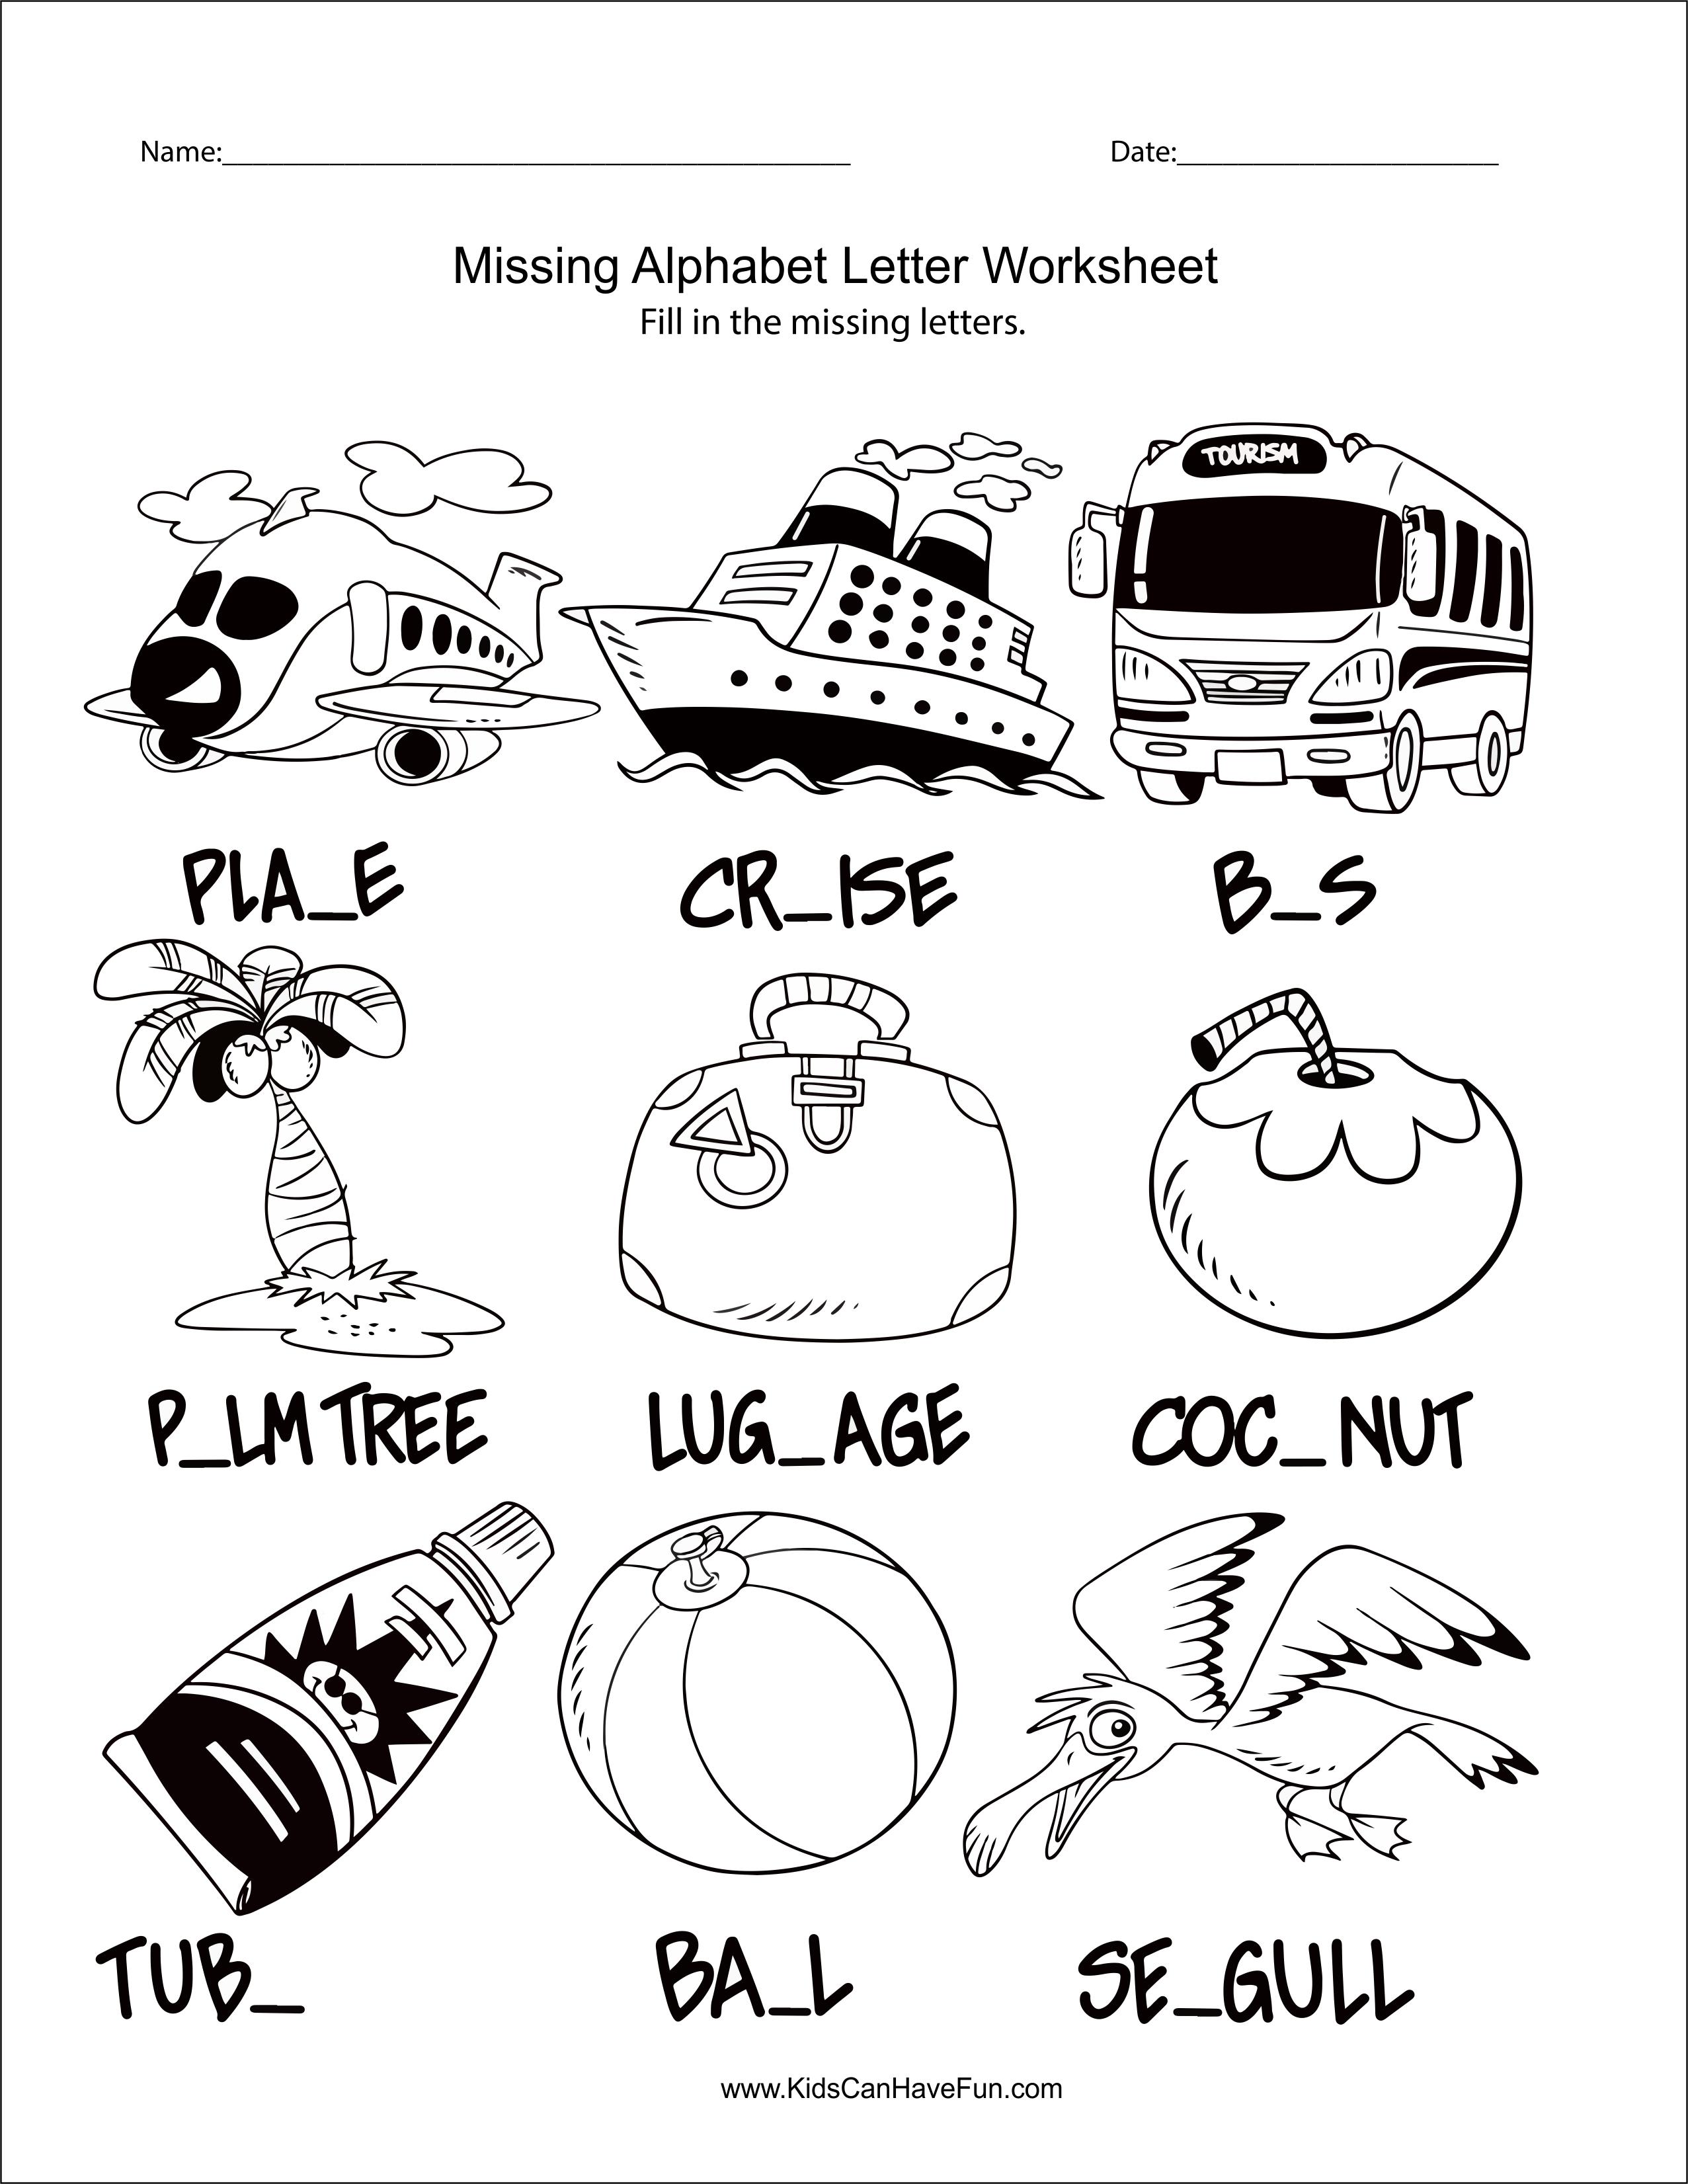 Missing Alphabet Letter Worksheet Alphabet Worksheets Alphabet Letter Worksheets Educational Worksheets [ 3303 x 2553 Pixel ]